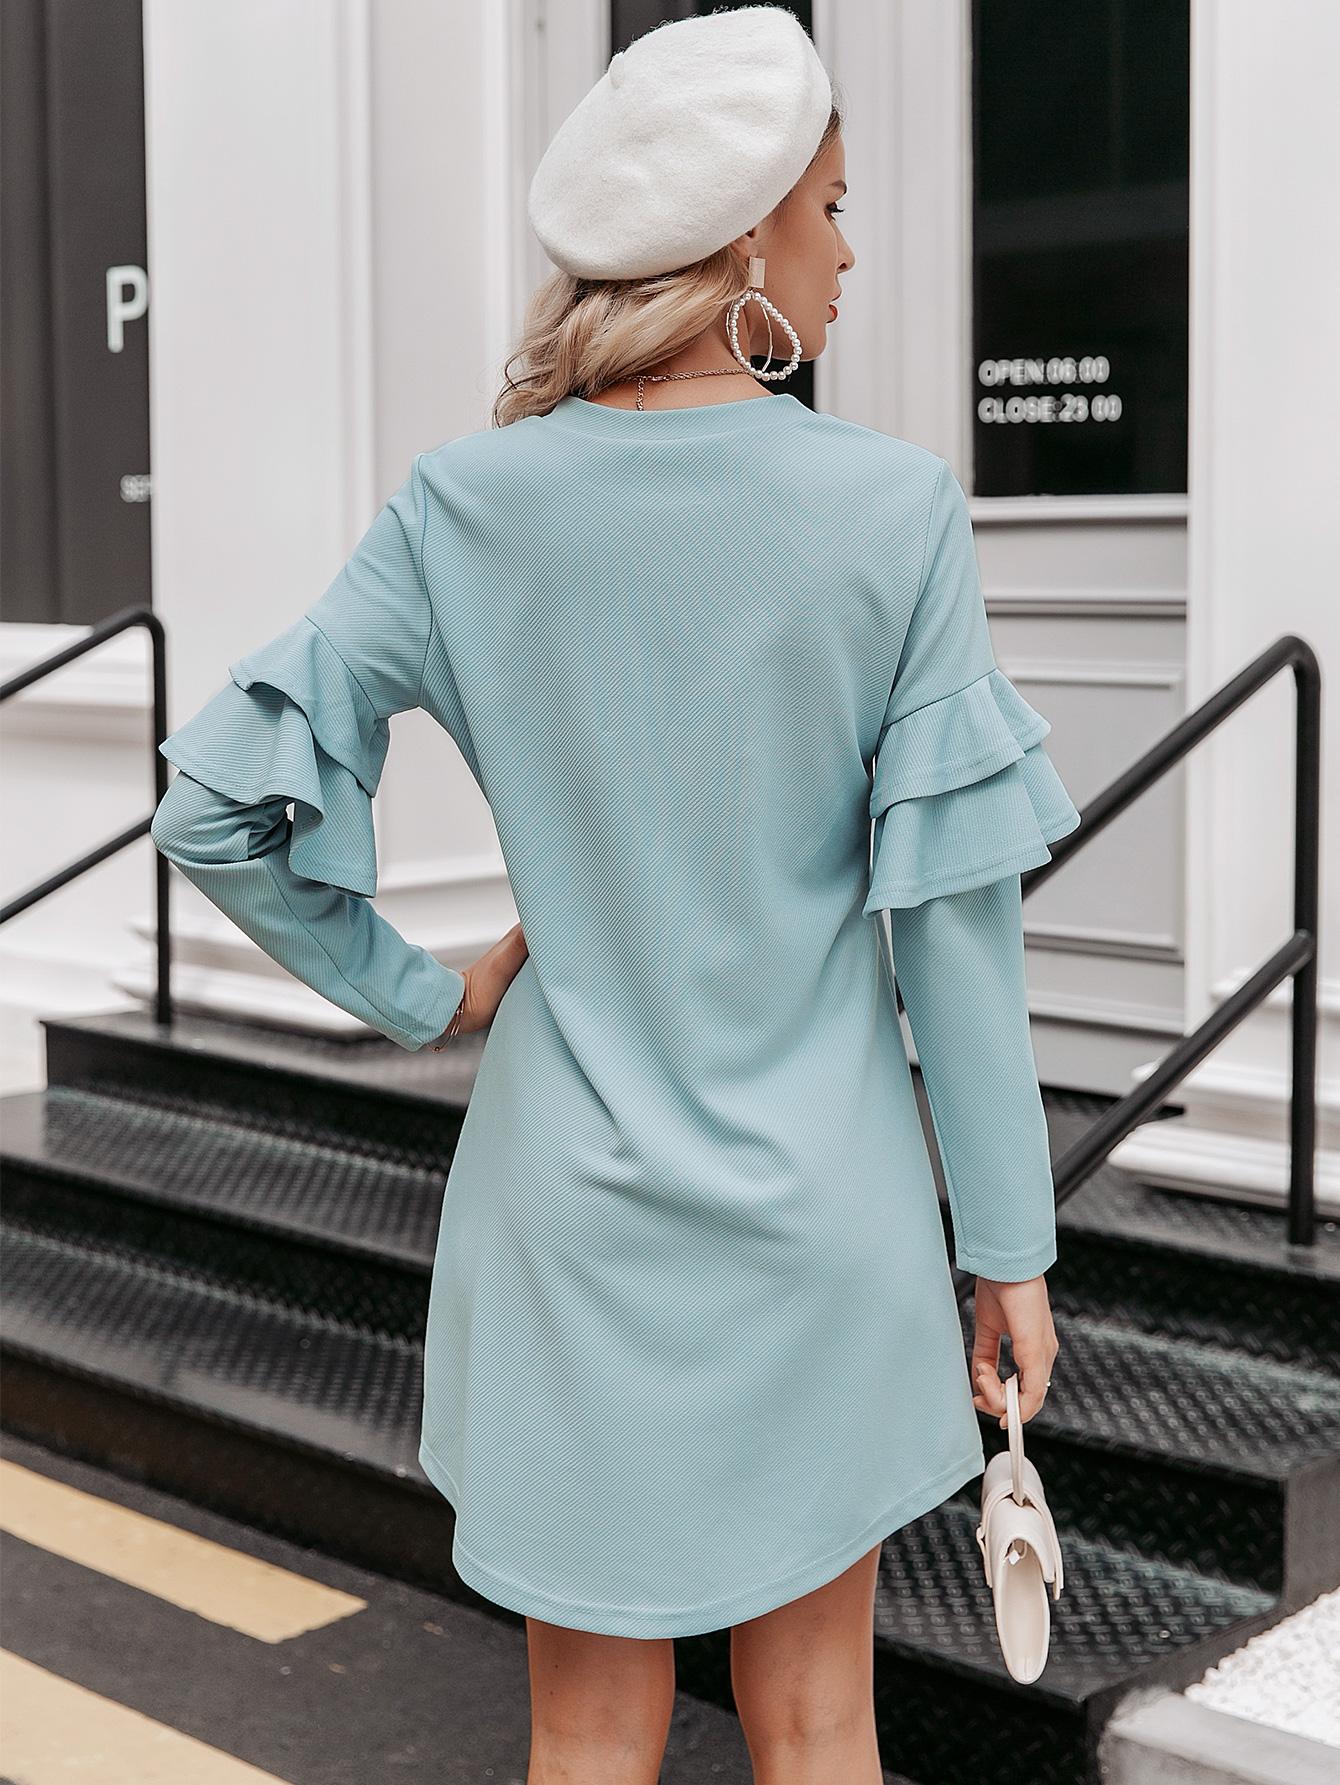 2019 New Light Blue Skirt Fashion Women Wholesale NHDE190217